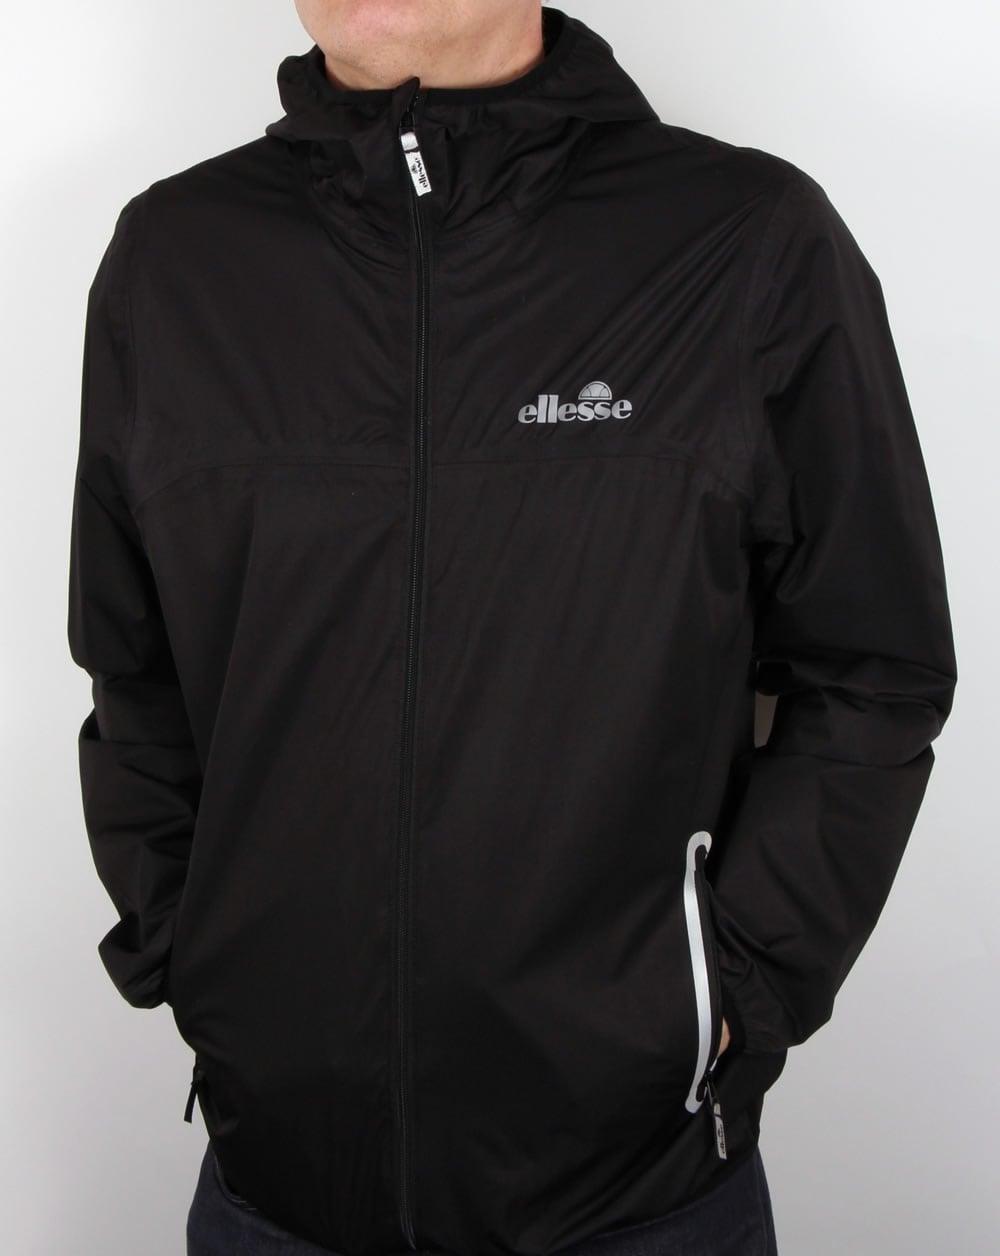 3744db831 Ellesse Comabbio Rain Jacket Black